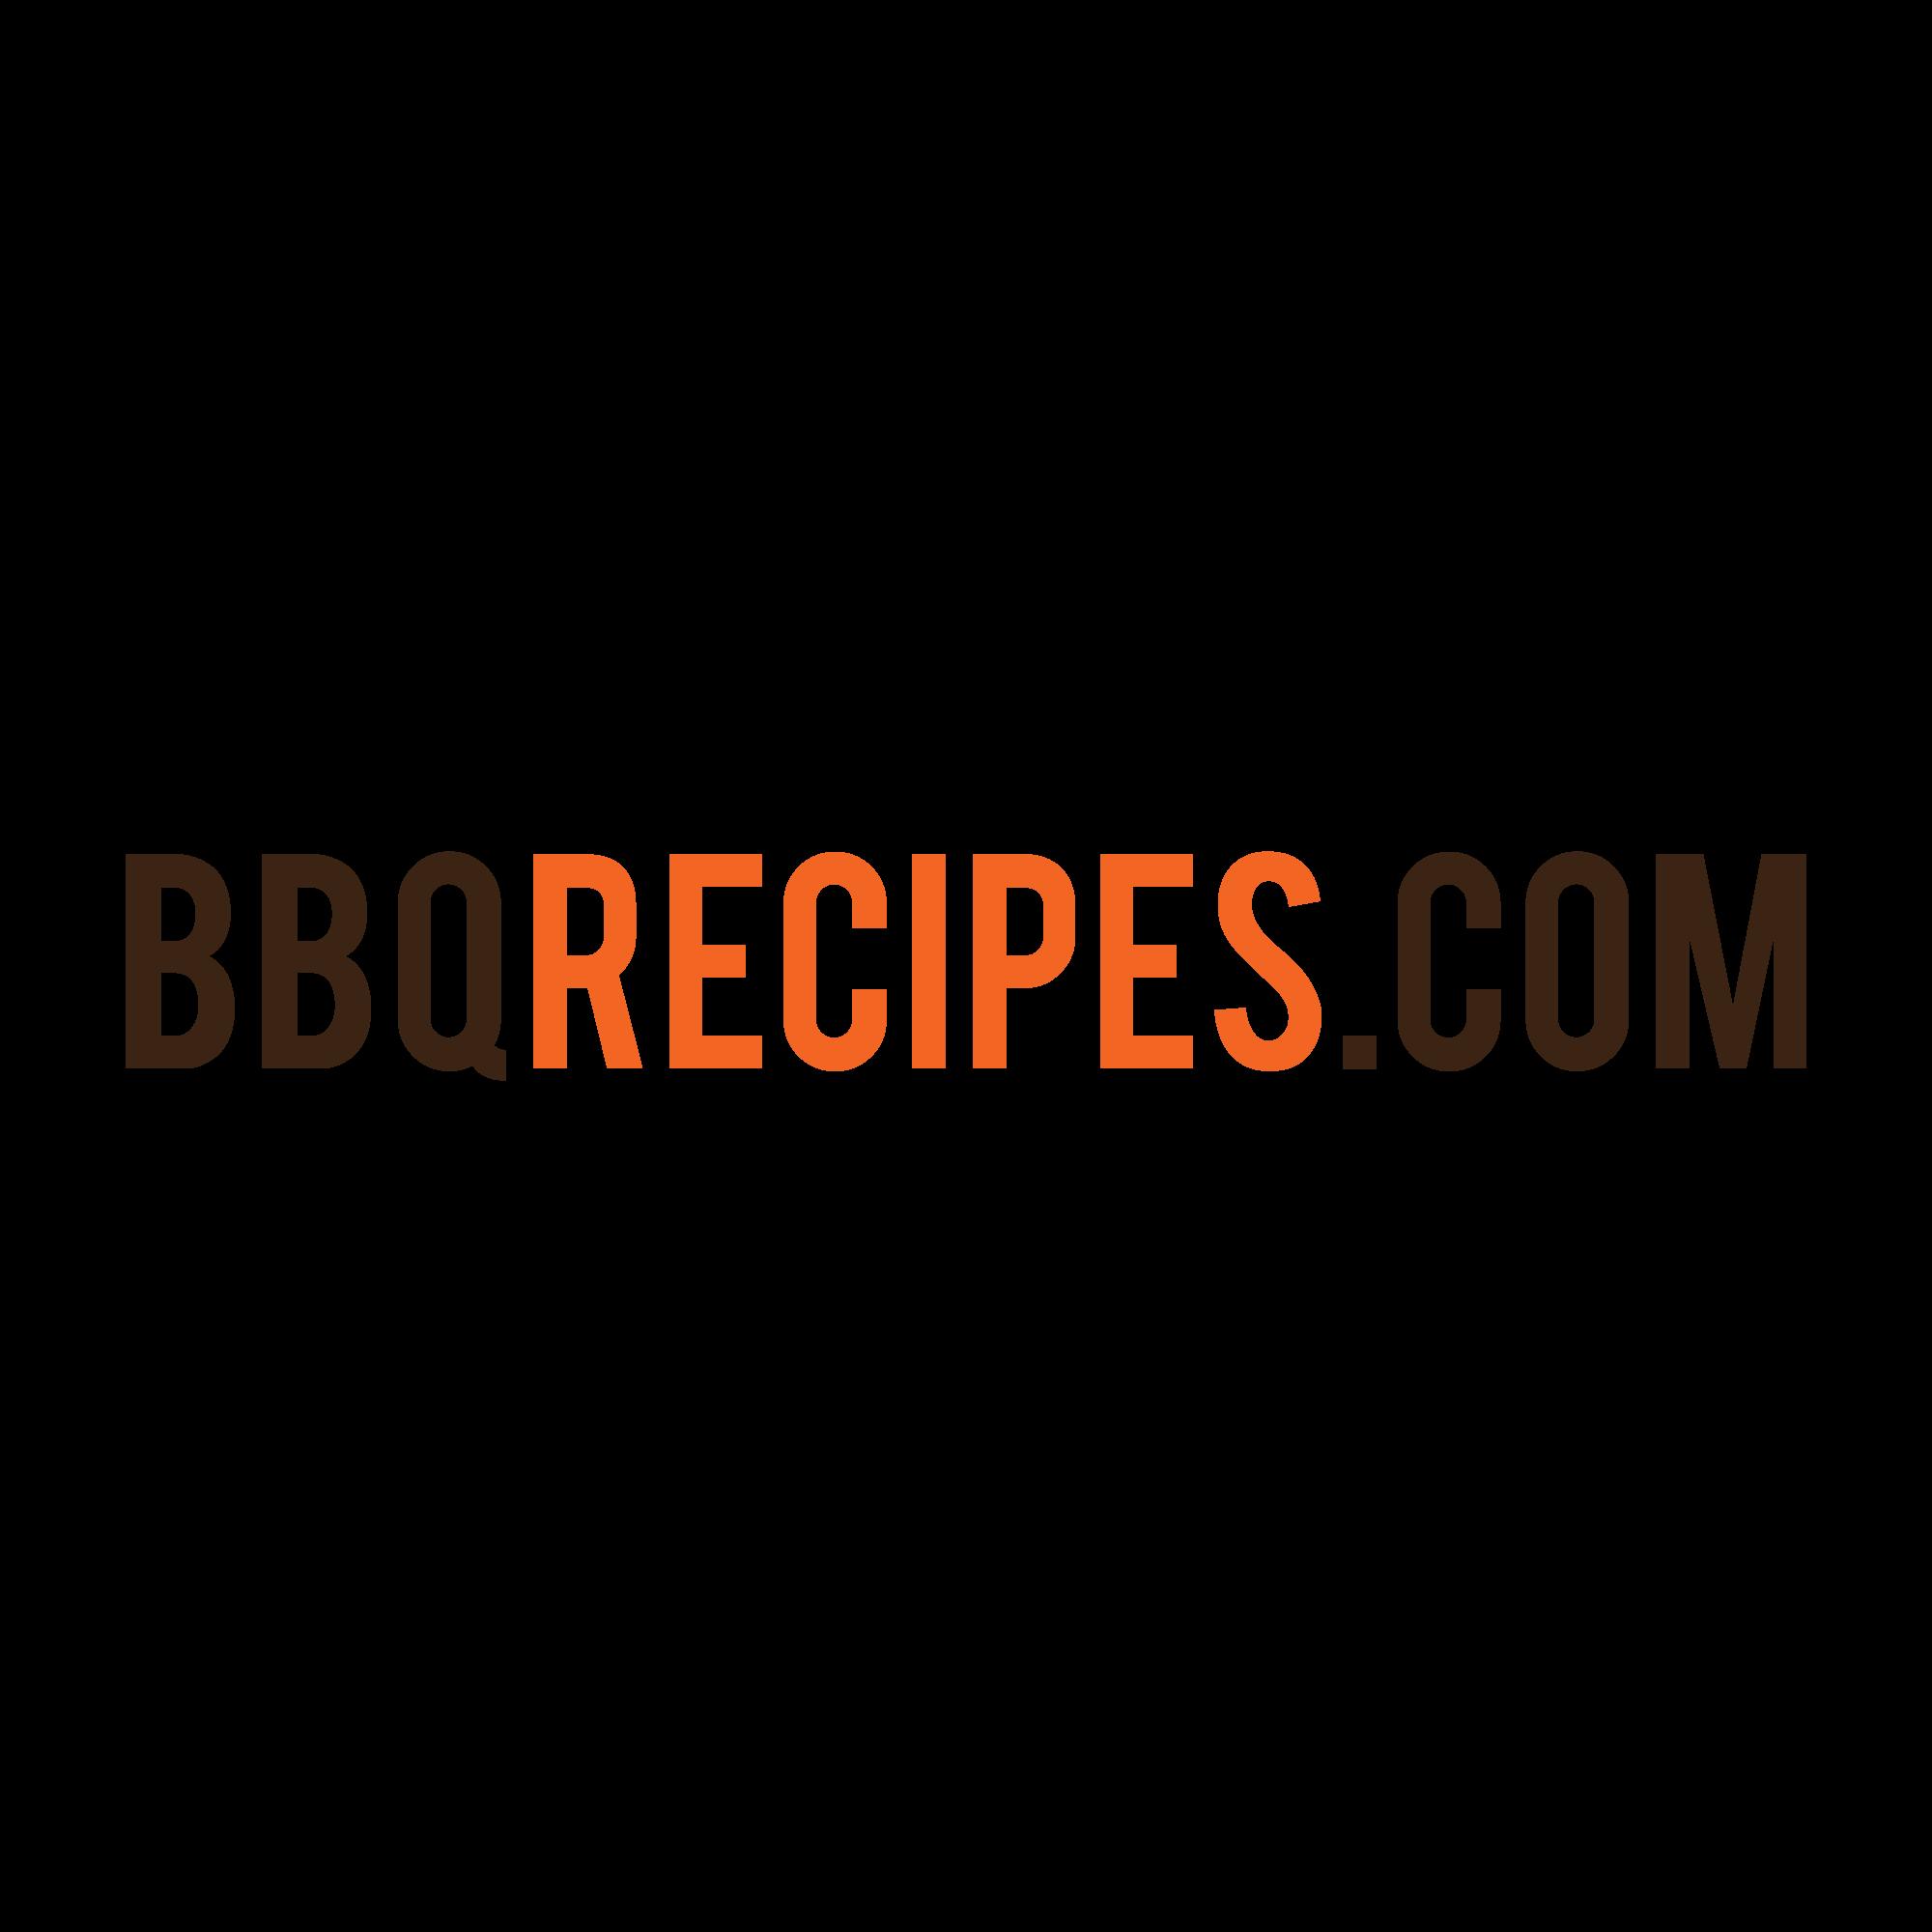 BBQRecipes.com